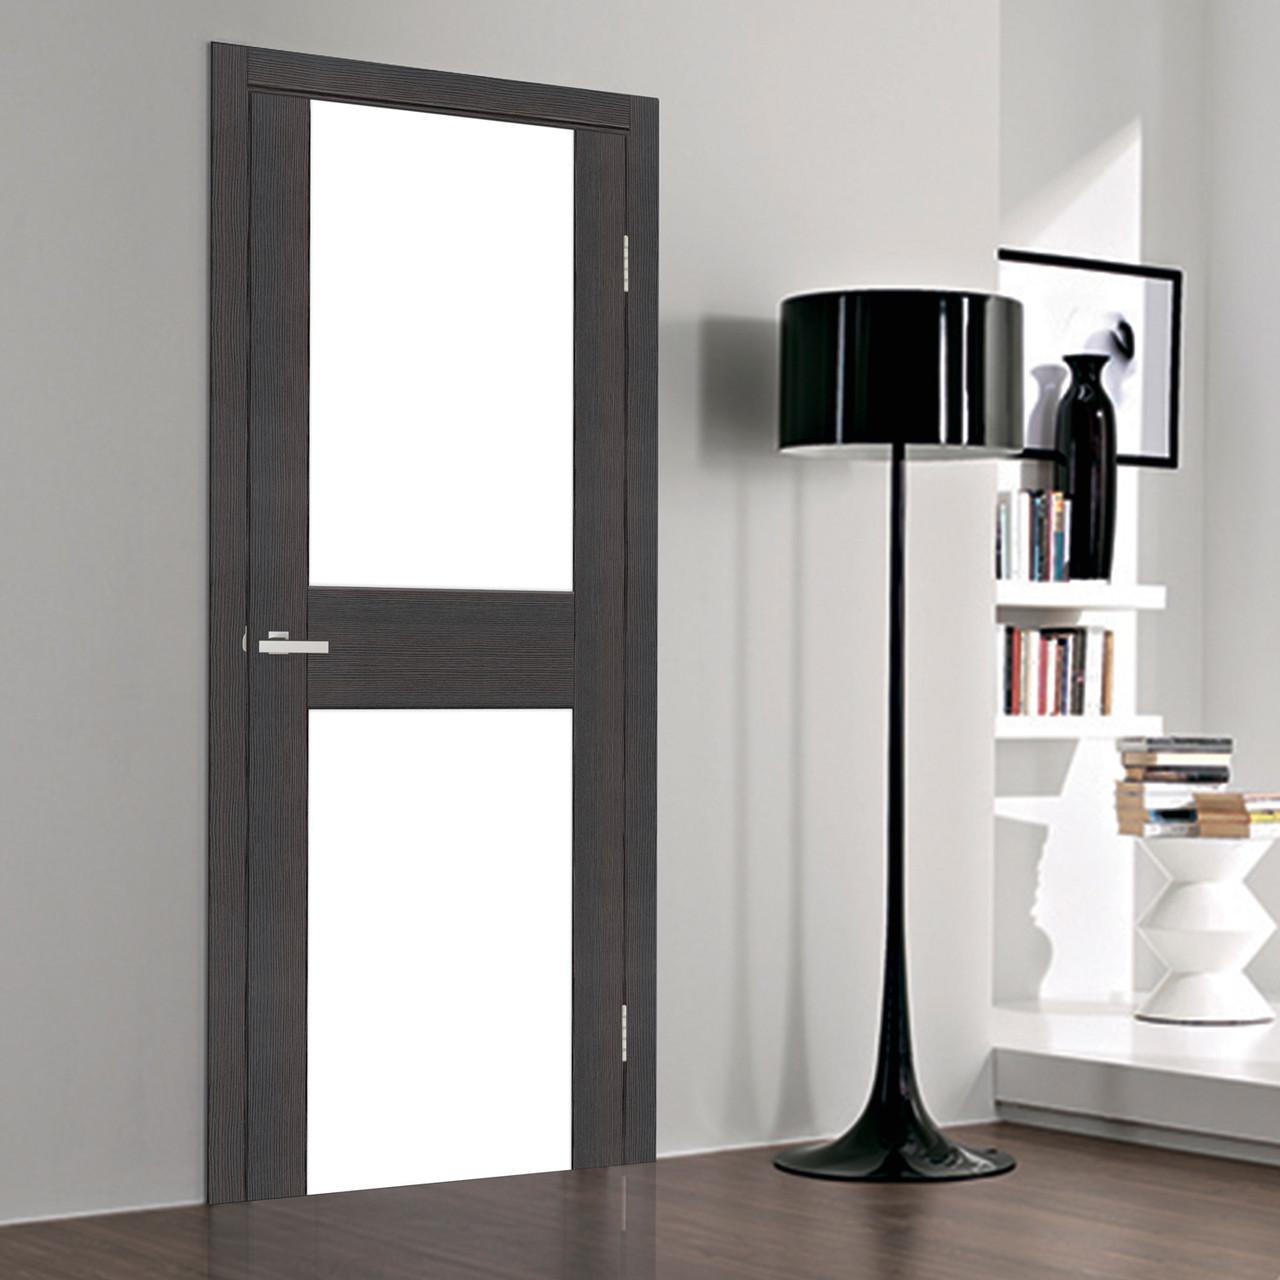 Дверное полотно Cortex Gloss 03 triplex молочный Wenge